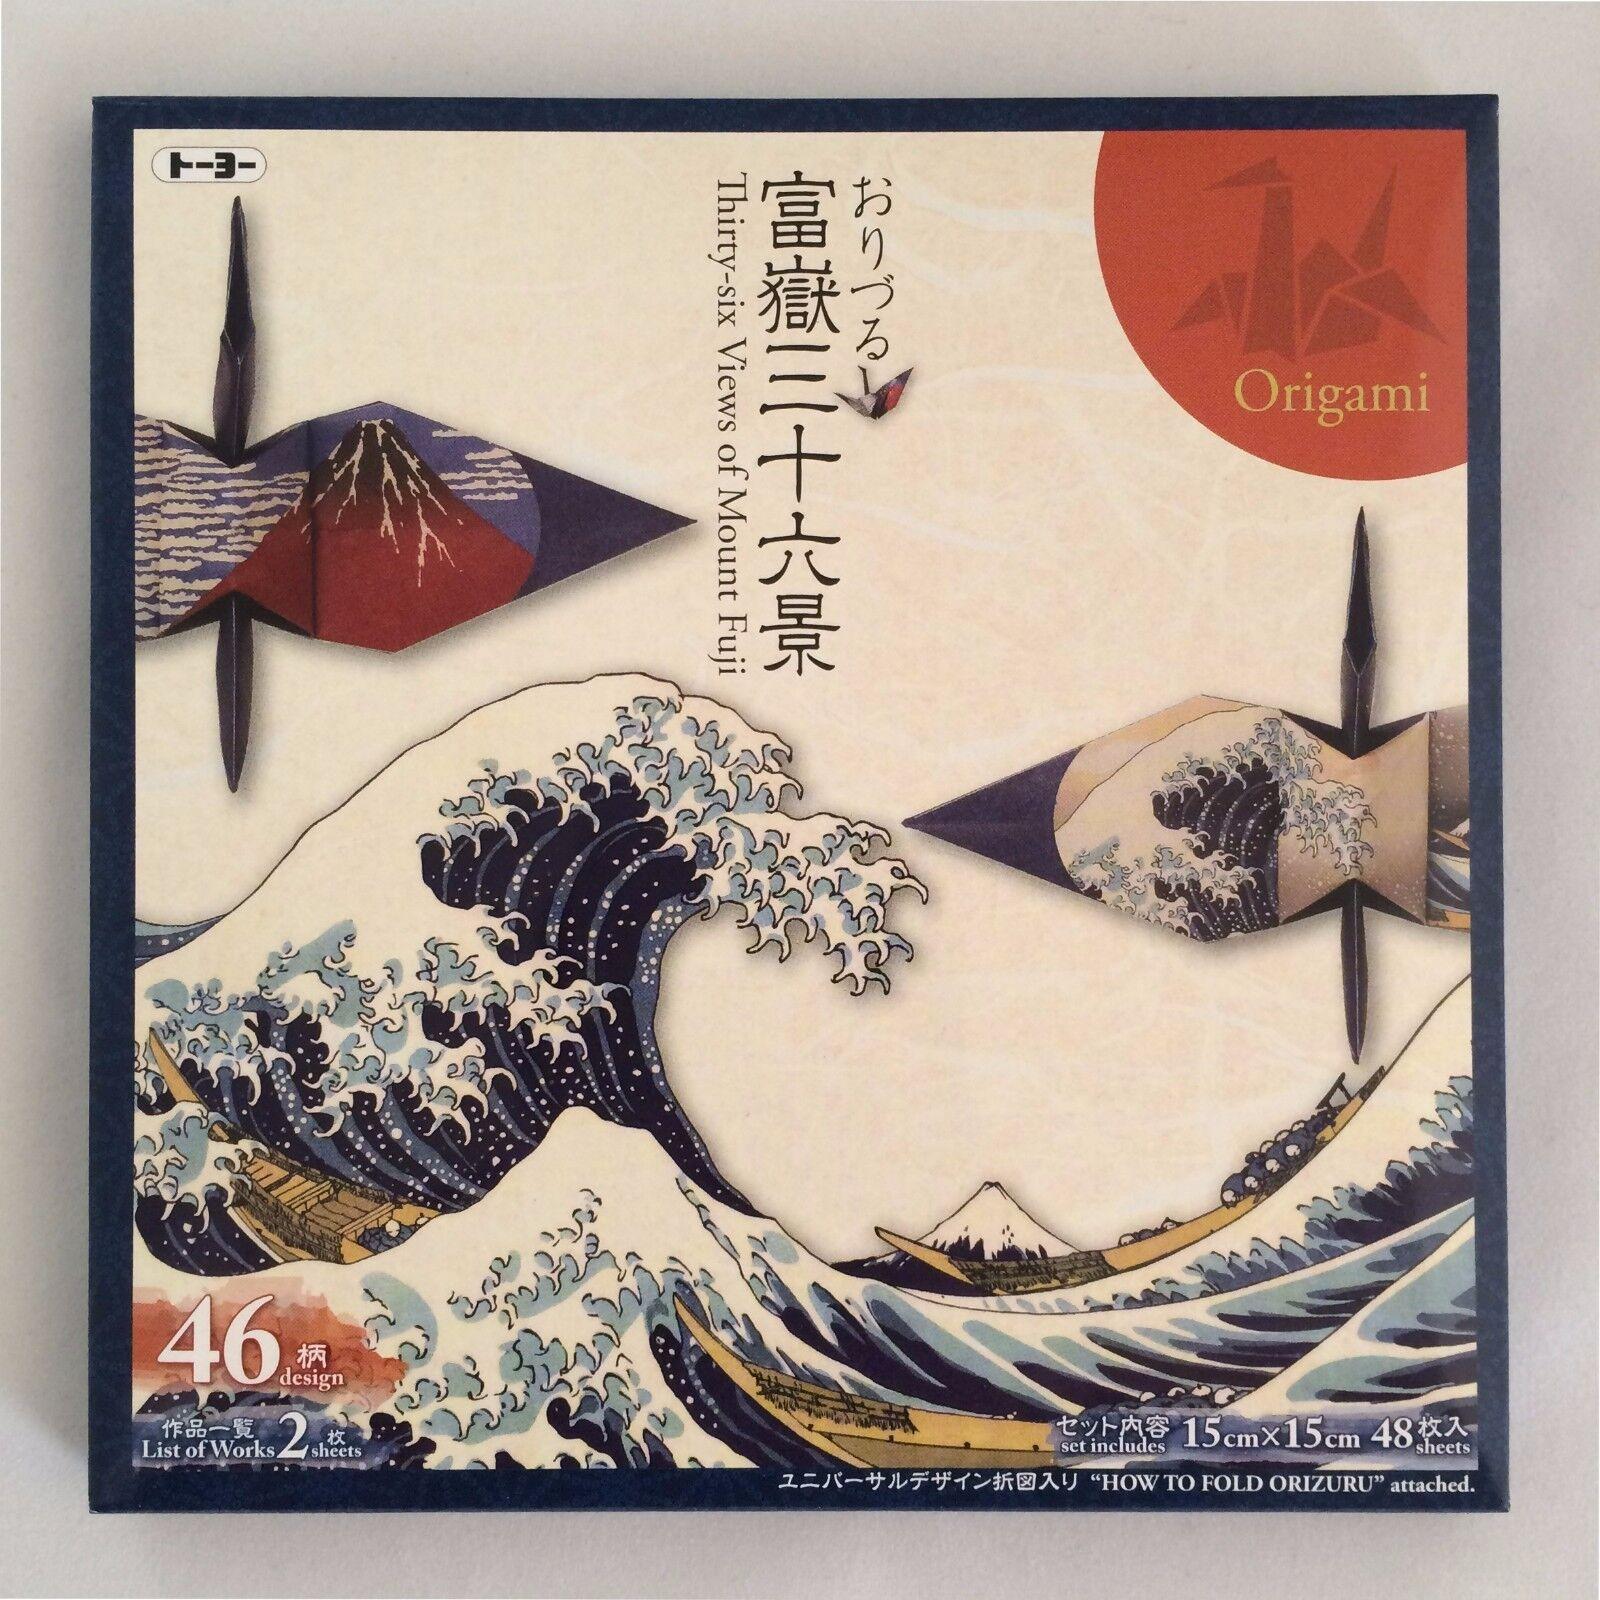 Japanese origami paper hokusai thirty six views of mtfuji 48 picture 1 of 5 jeuxipadfo Images